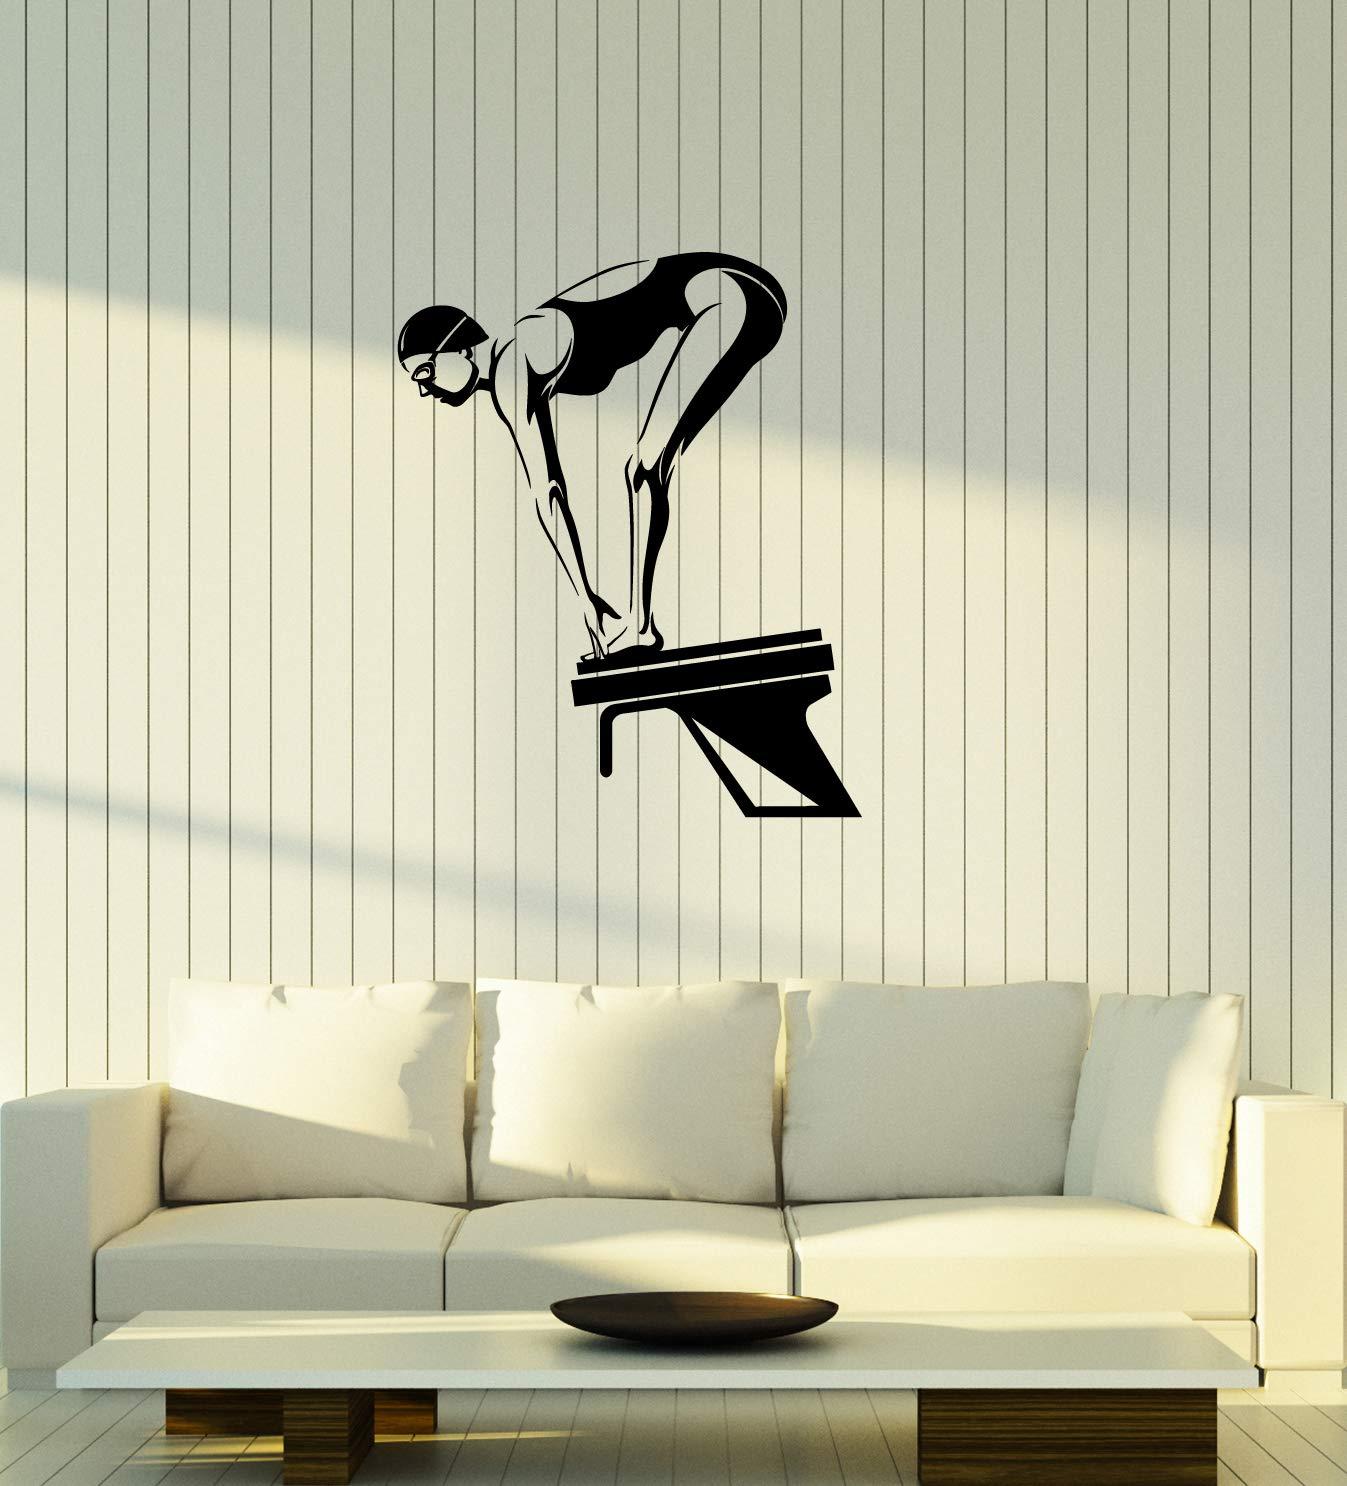 Amazon Vinyl Decal Swimmer Swimming Pool Wall Sticker Mural